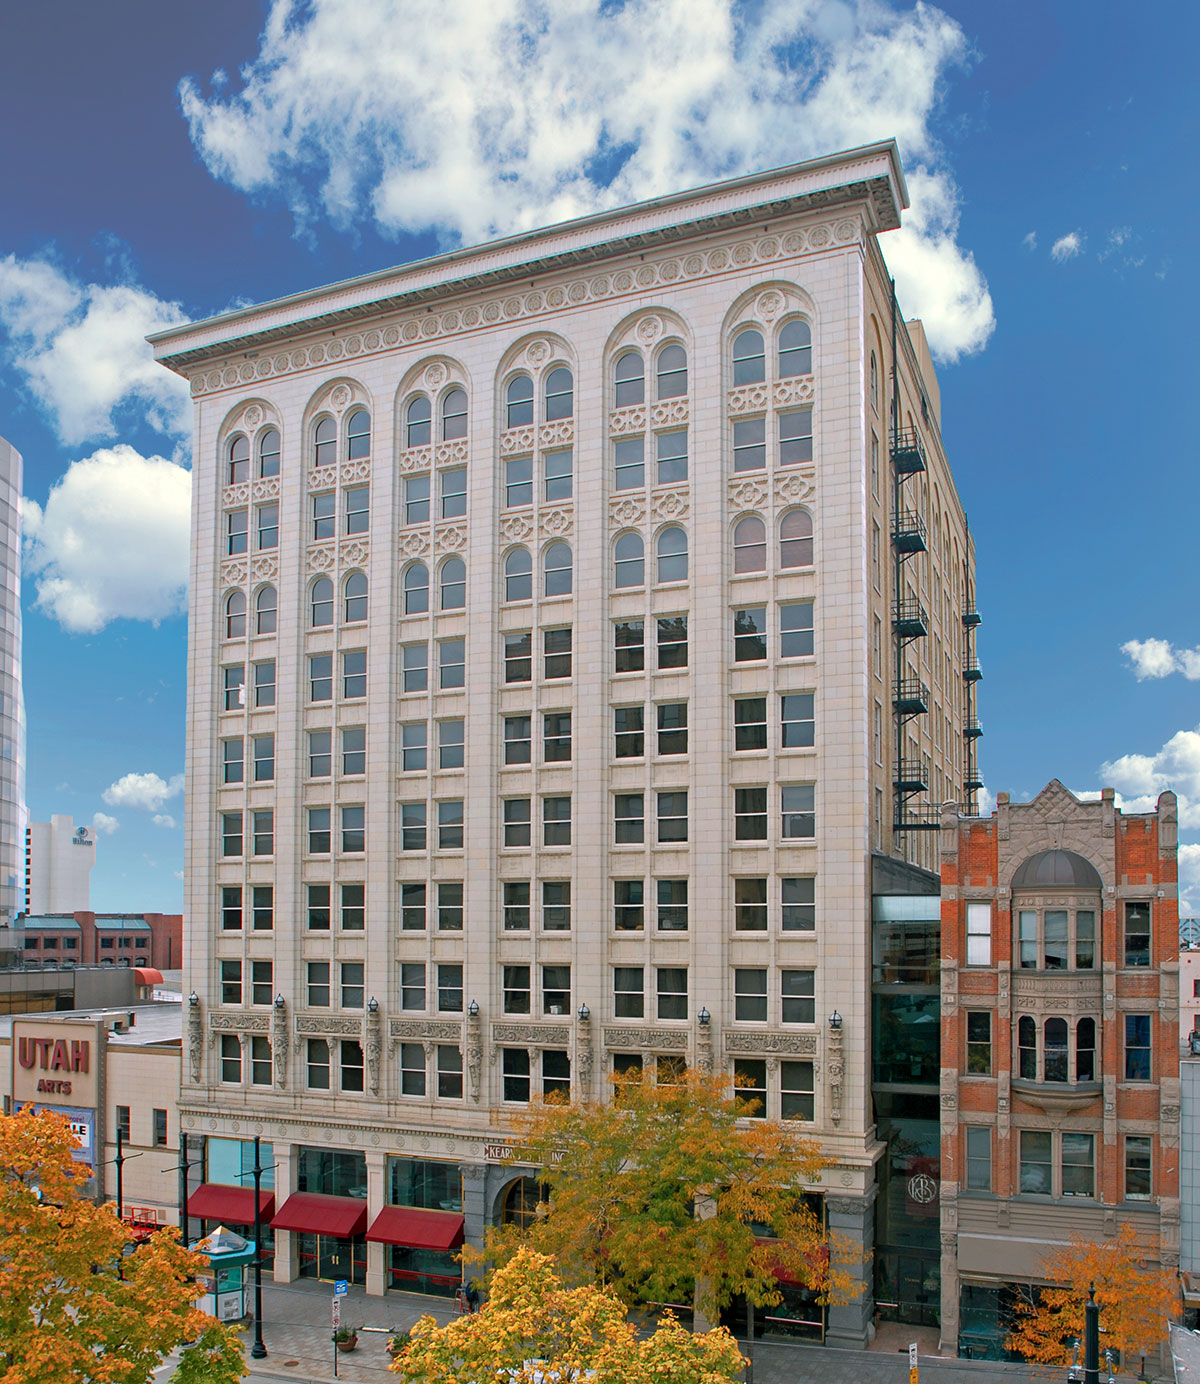 Downtown Salt Lake City Living: The Kearns Building